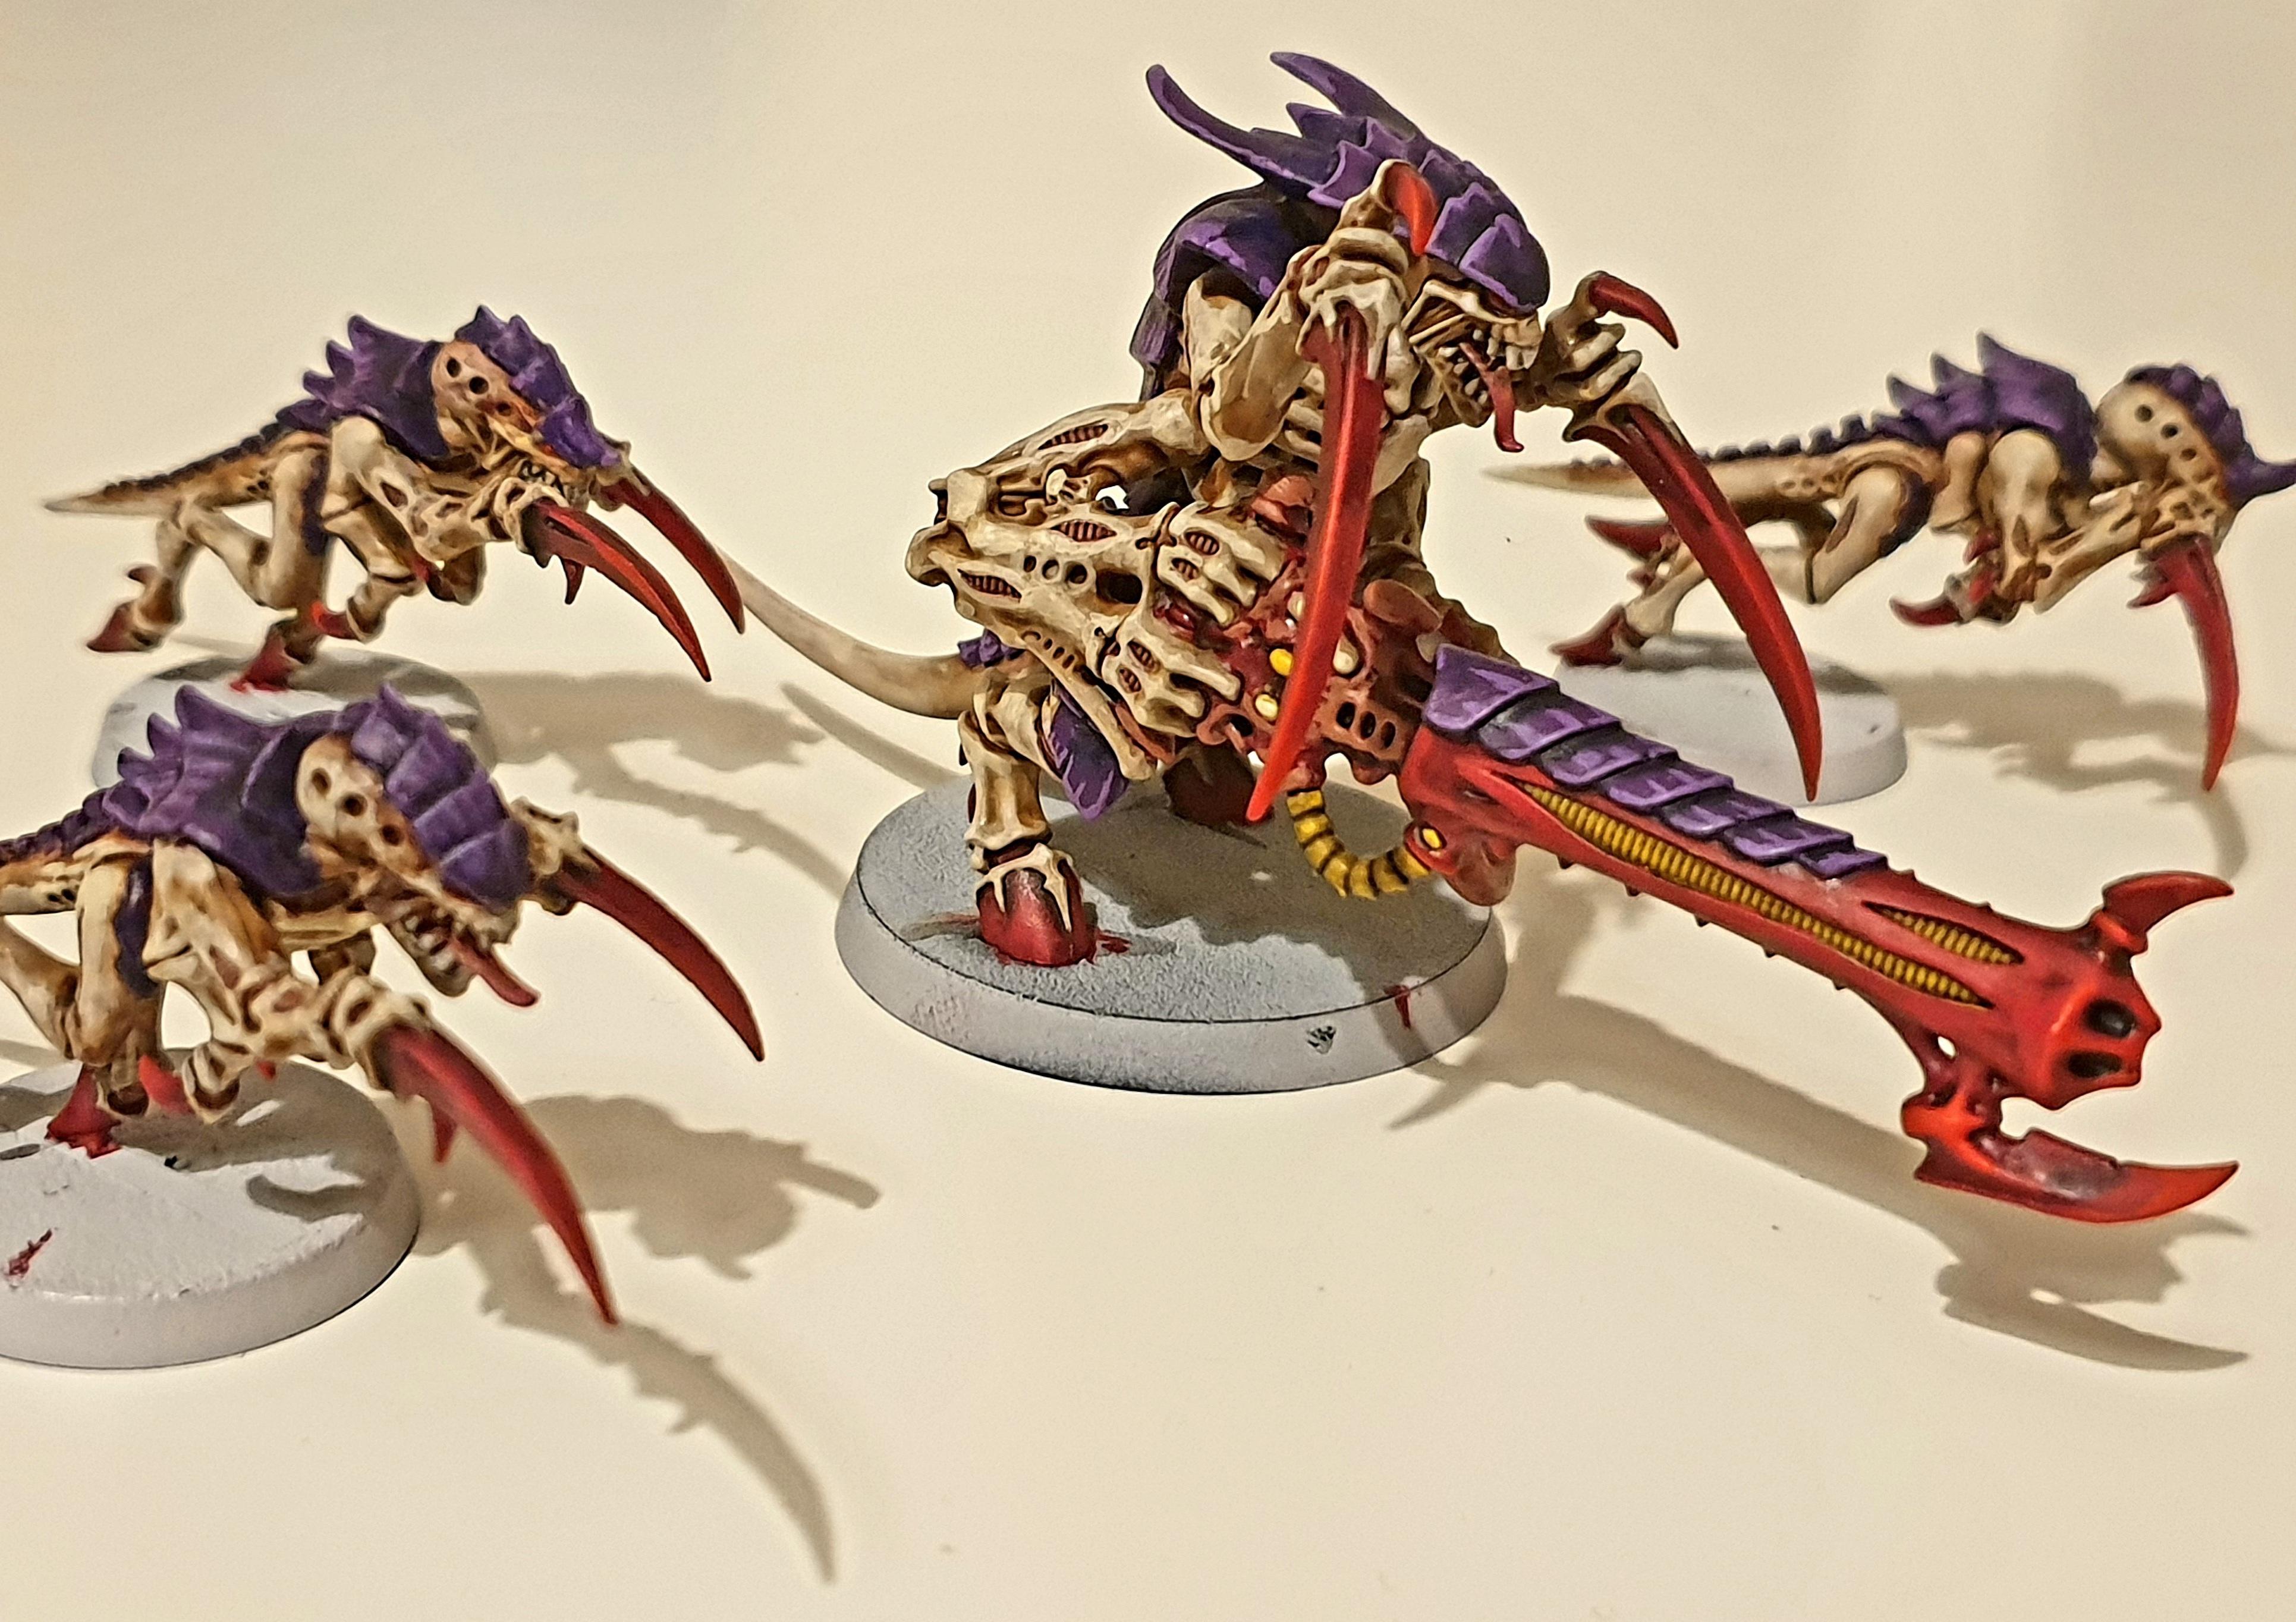 Tyranid Warrior Leviathan